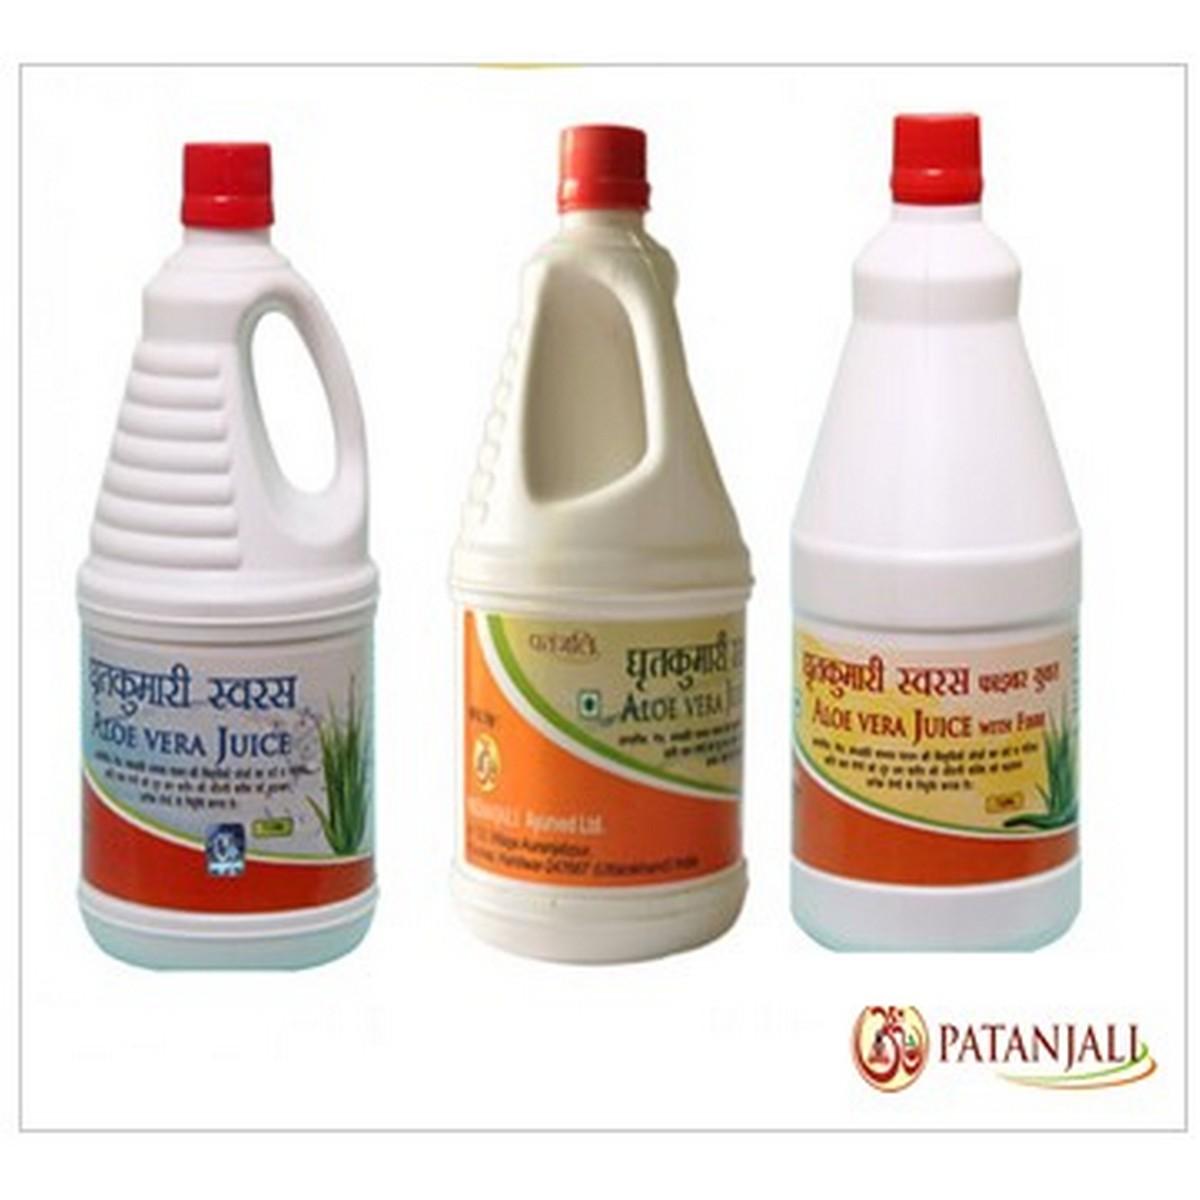 Patanjali Aloe Vera Juice Review Benefits Uses And Price